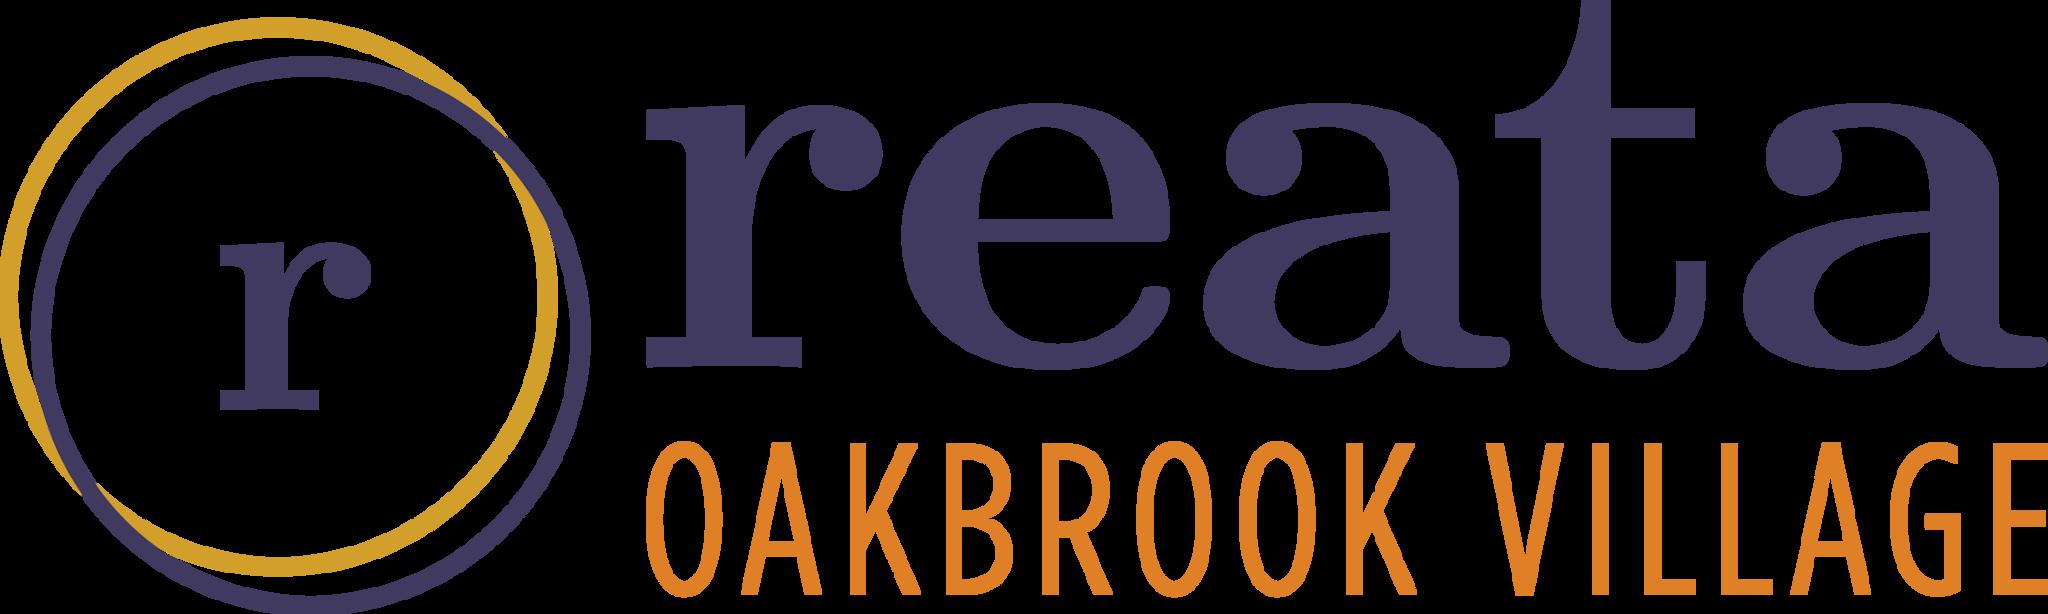 Reata oakbrook village apartments laguna hills logo